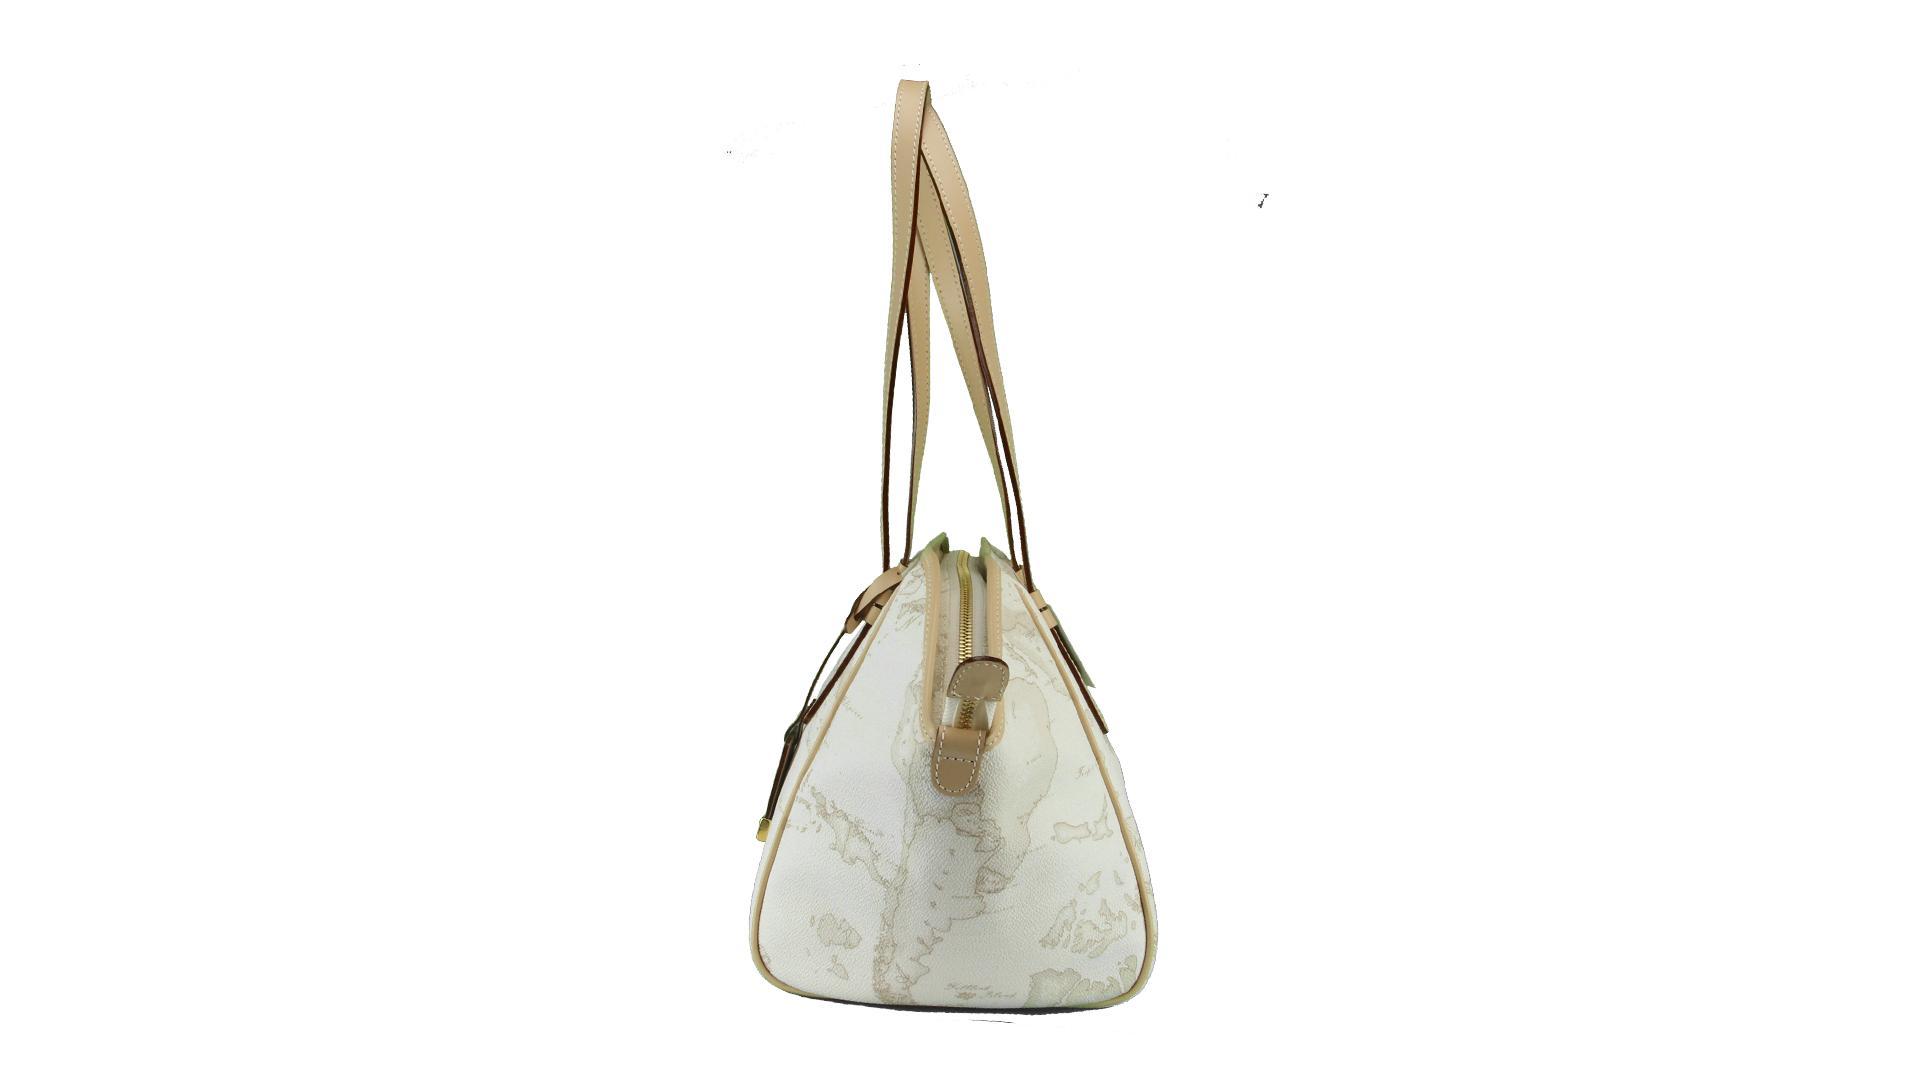 Shoulder bag Alviero Martini 1A Classe New Basic N133 6188 900 Bianco